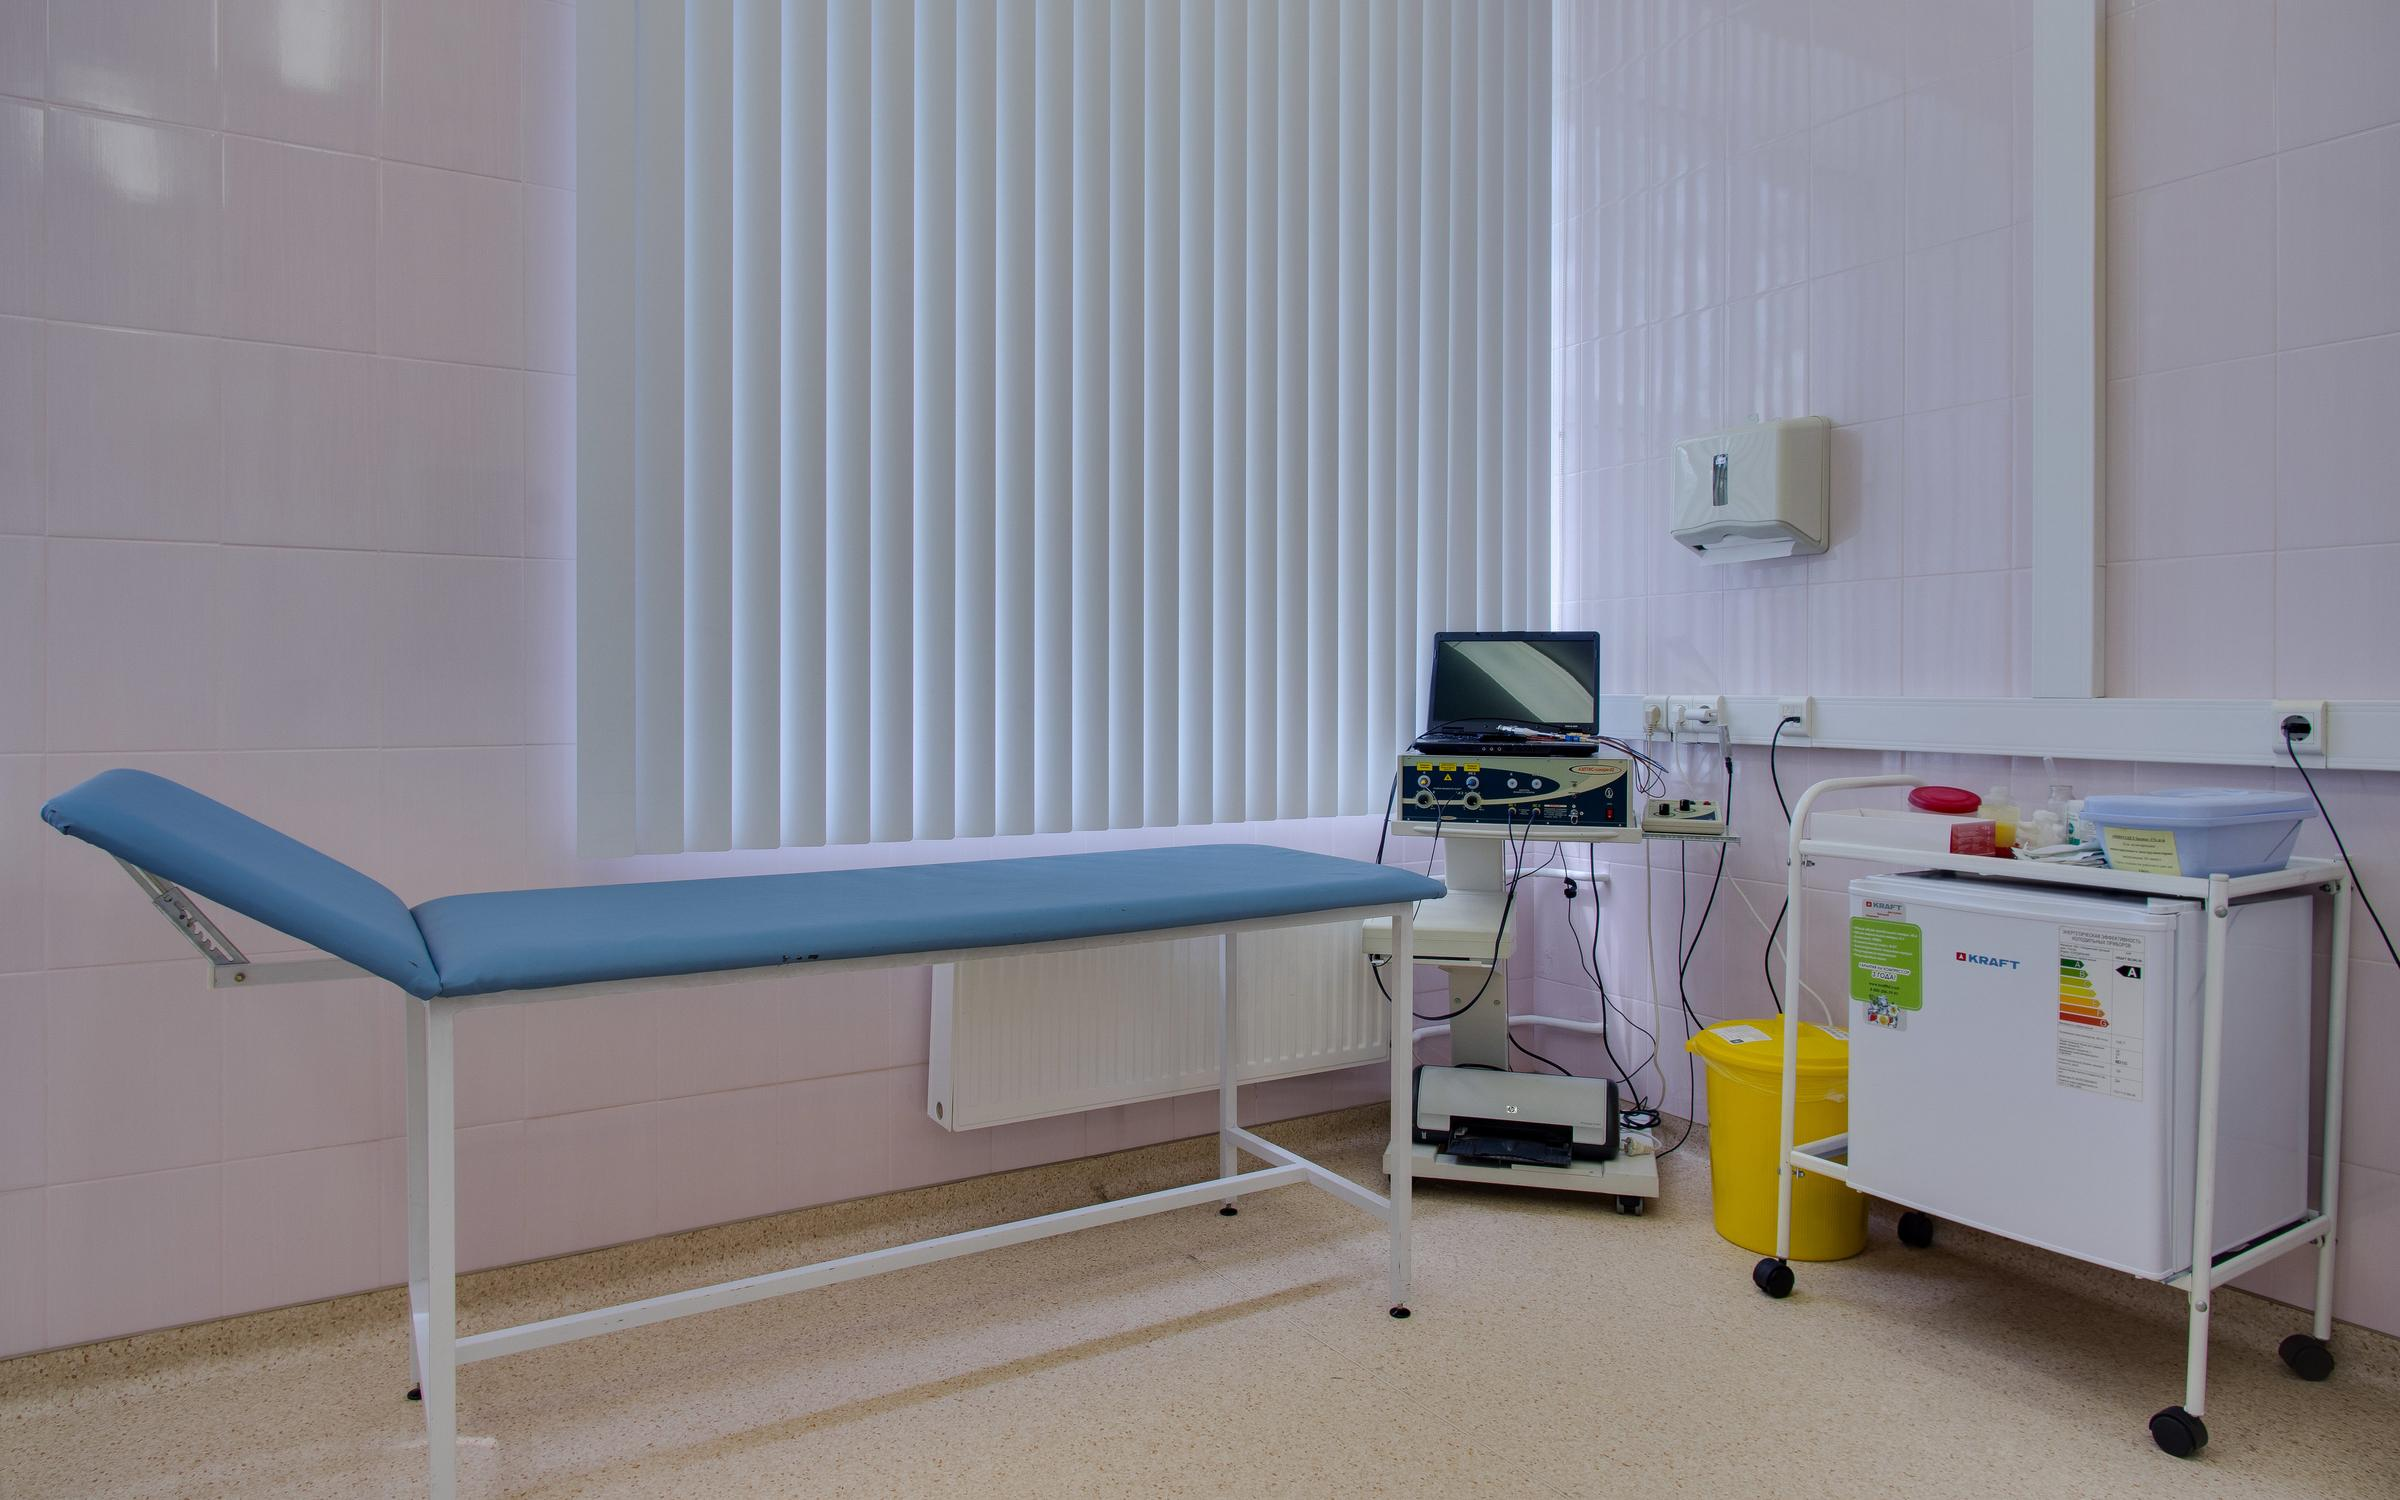 3 поликлиника регистратура майкоп